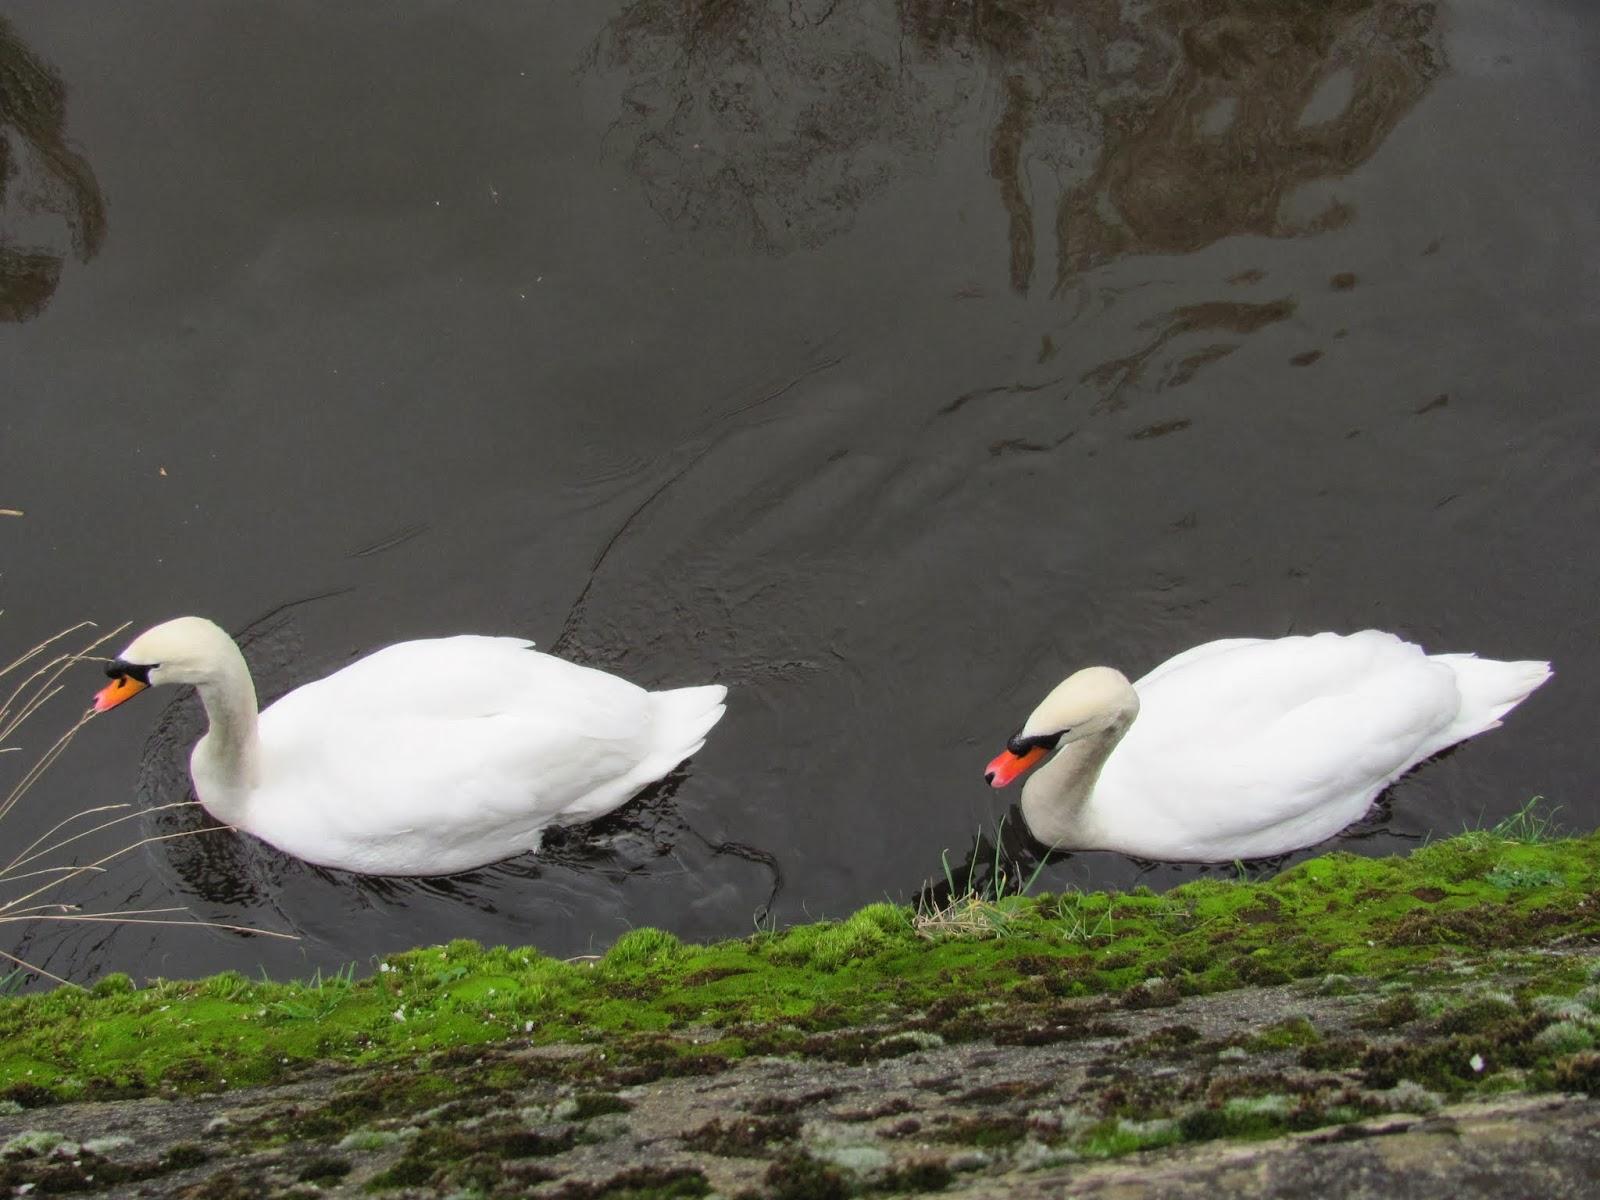 Swans in the Dodder in Dublin